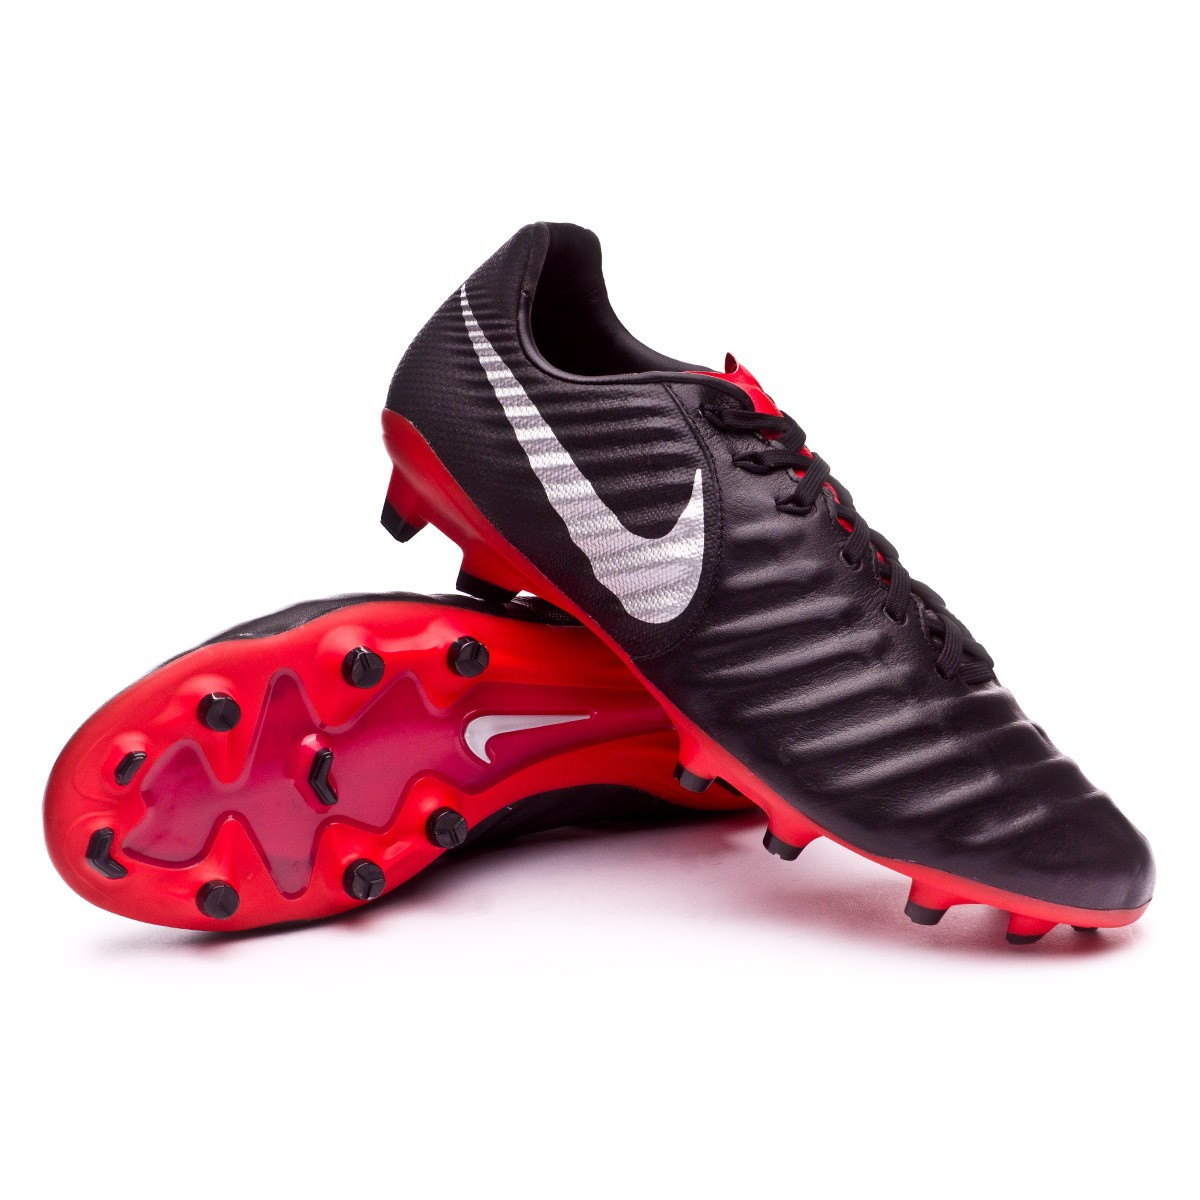 371326da6c857 Football Boots Nike Tiempo Legend VII Pro FG Black-Metallic silver-Light  crimson - Football store Fútbol Emotion